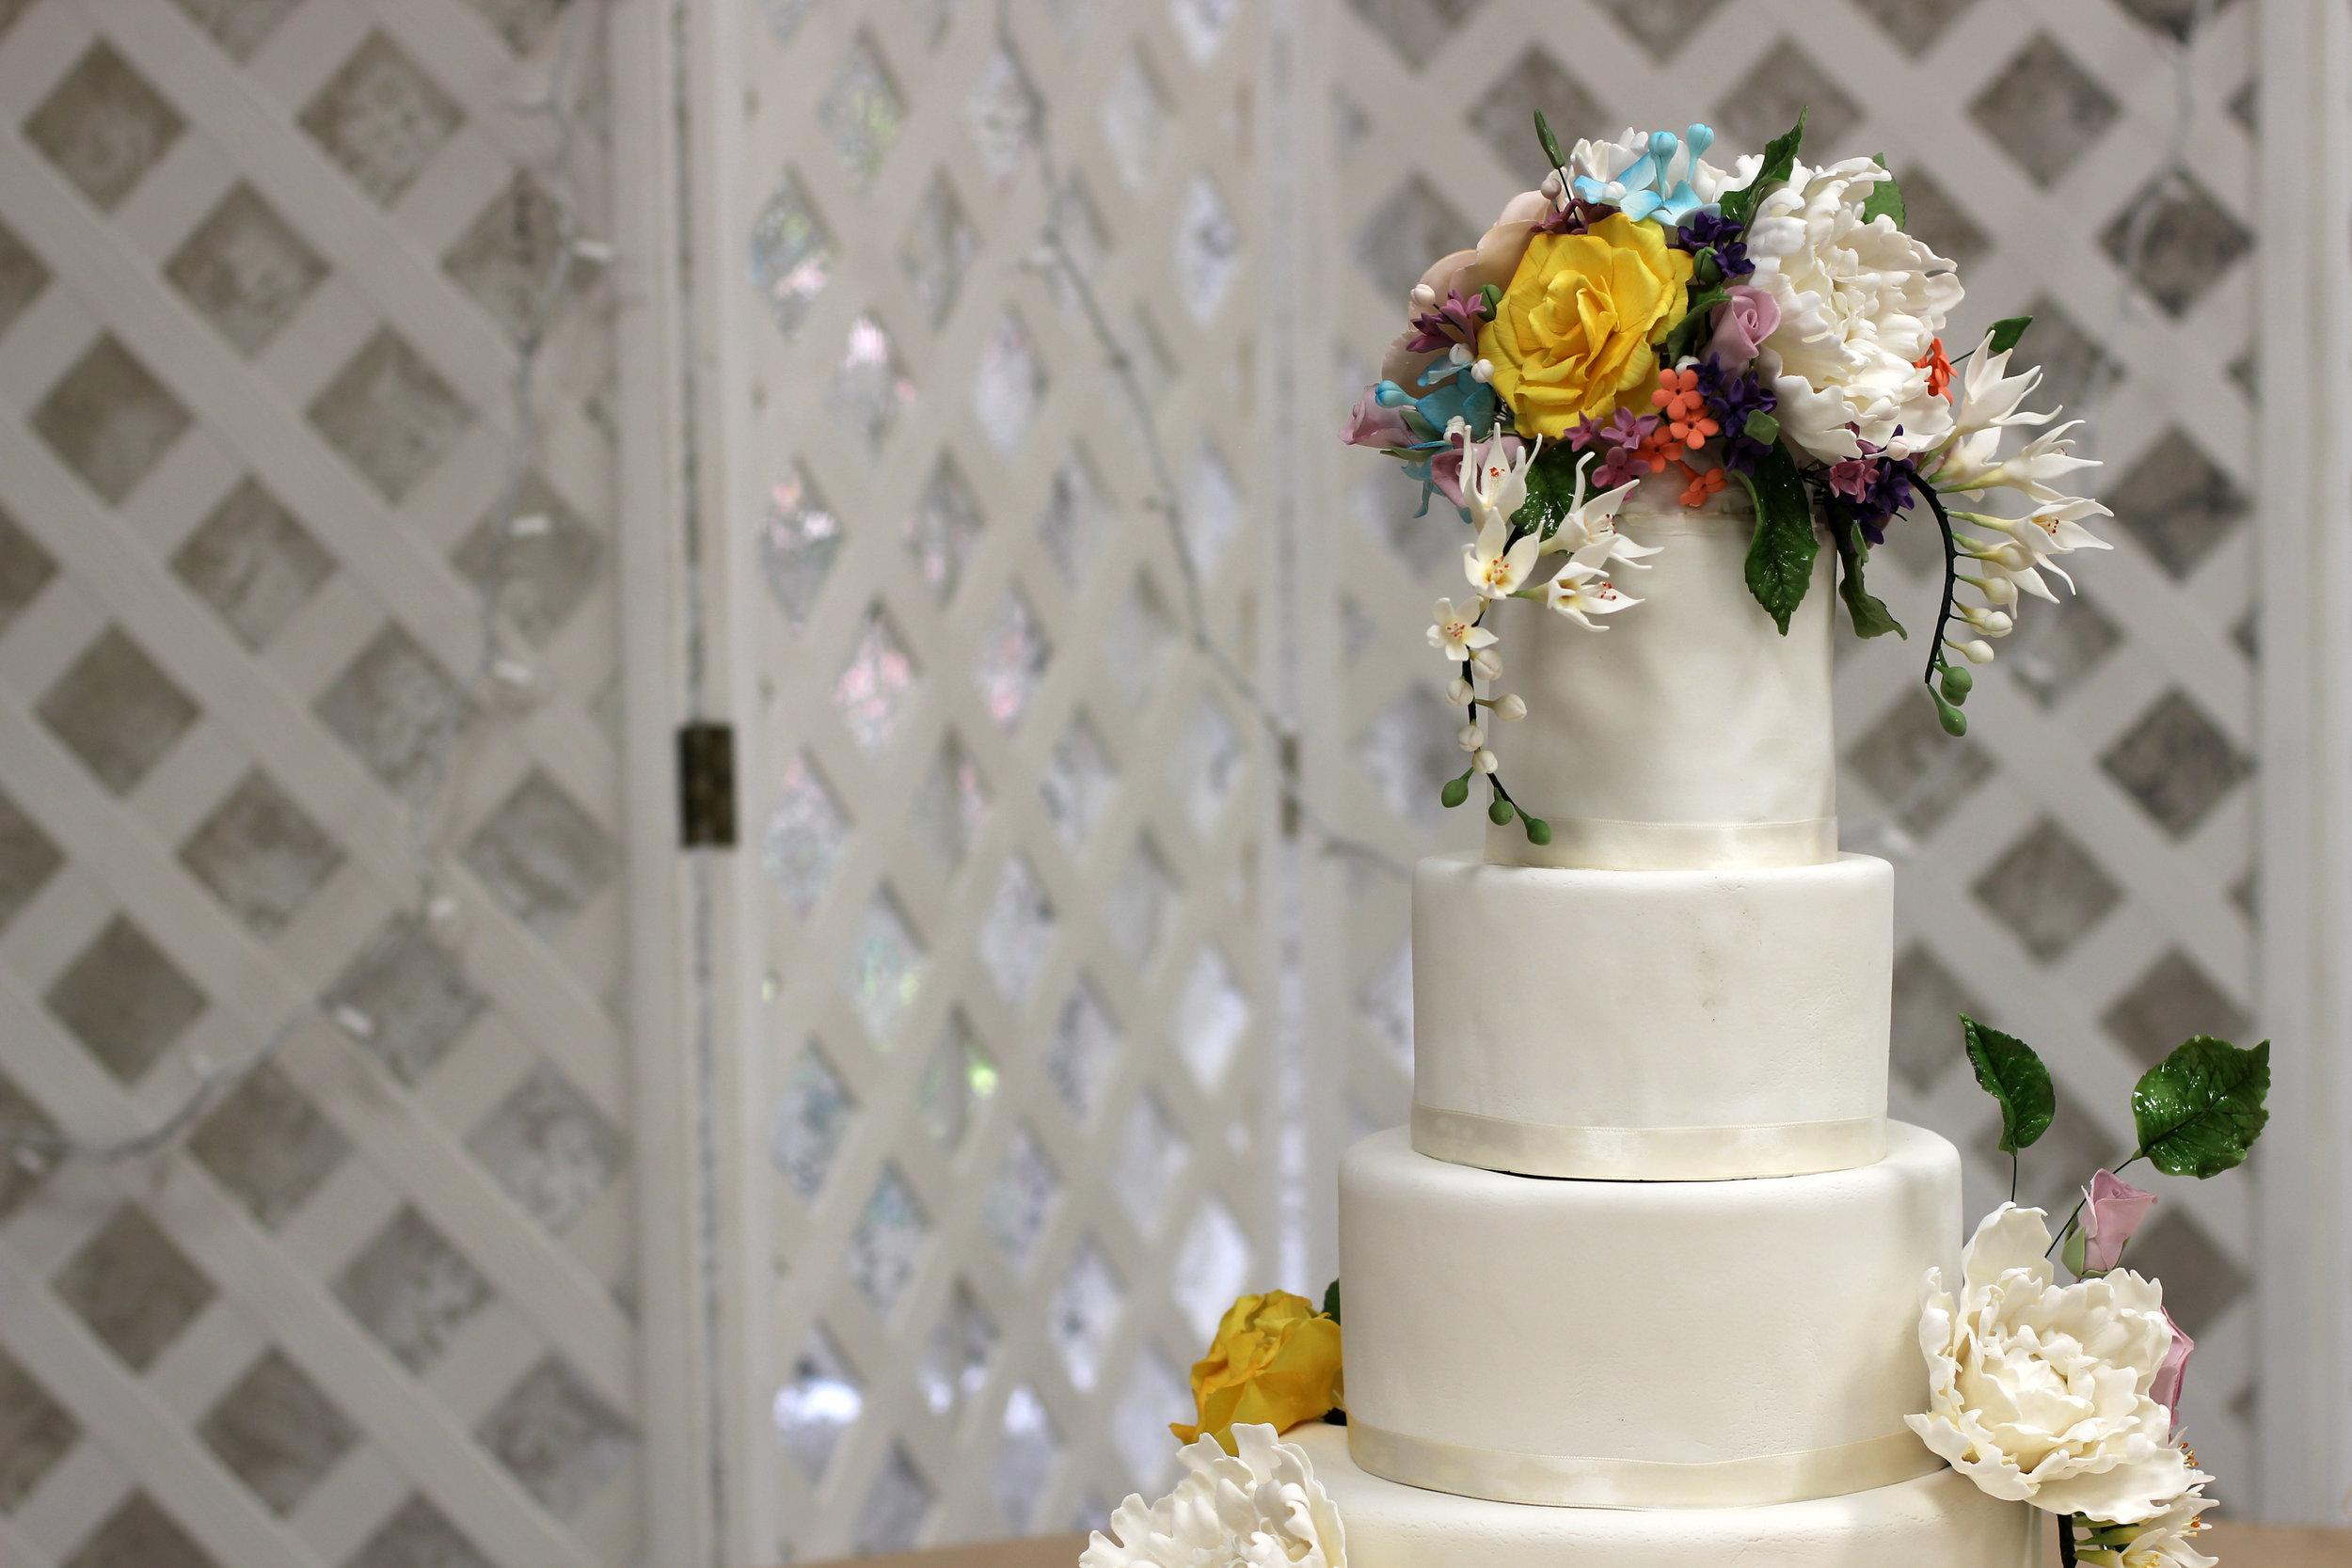 Bex wedding cake 2.jpg